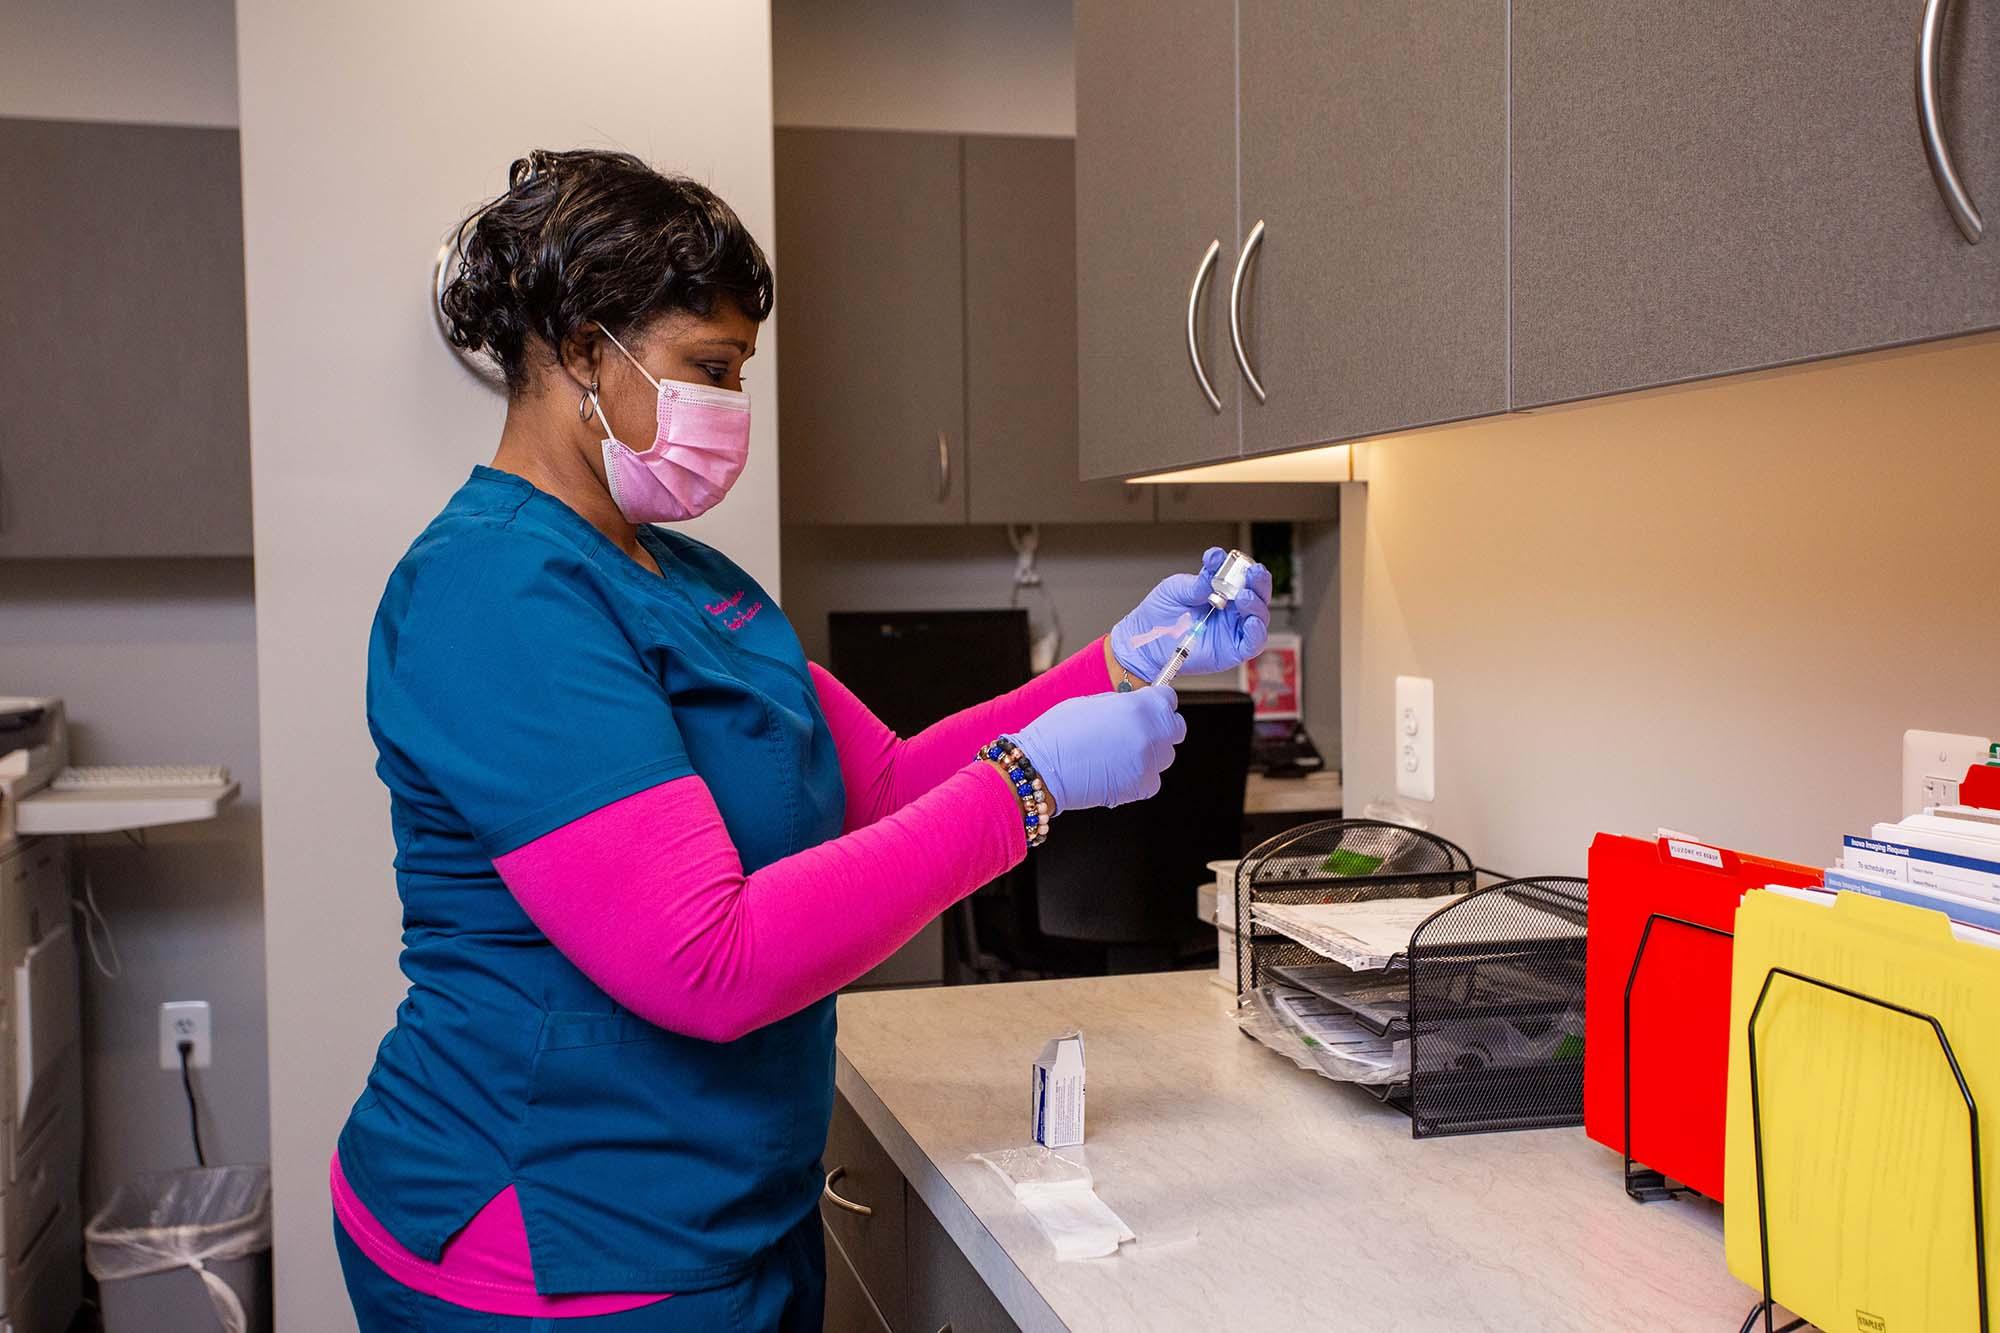 Primary Care Services in Alexandria, VA